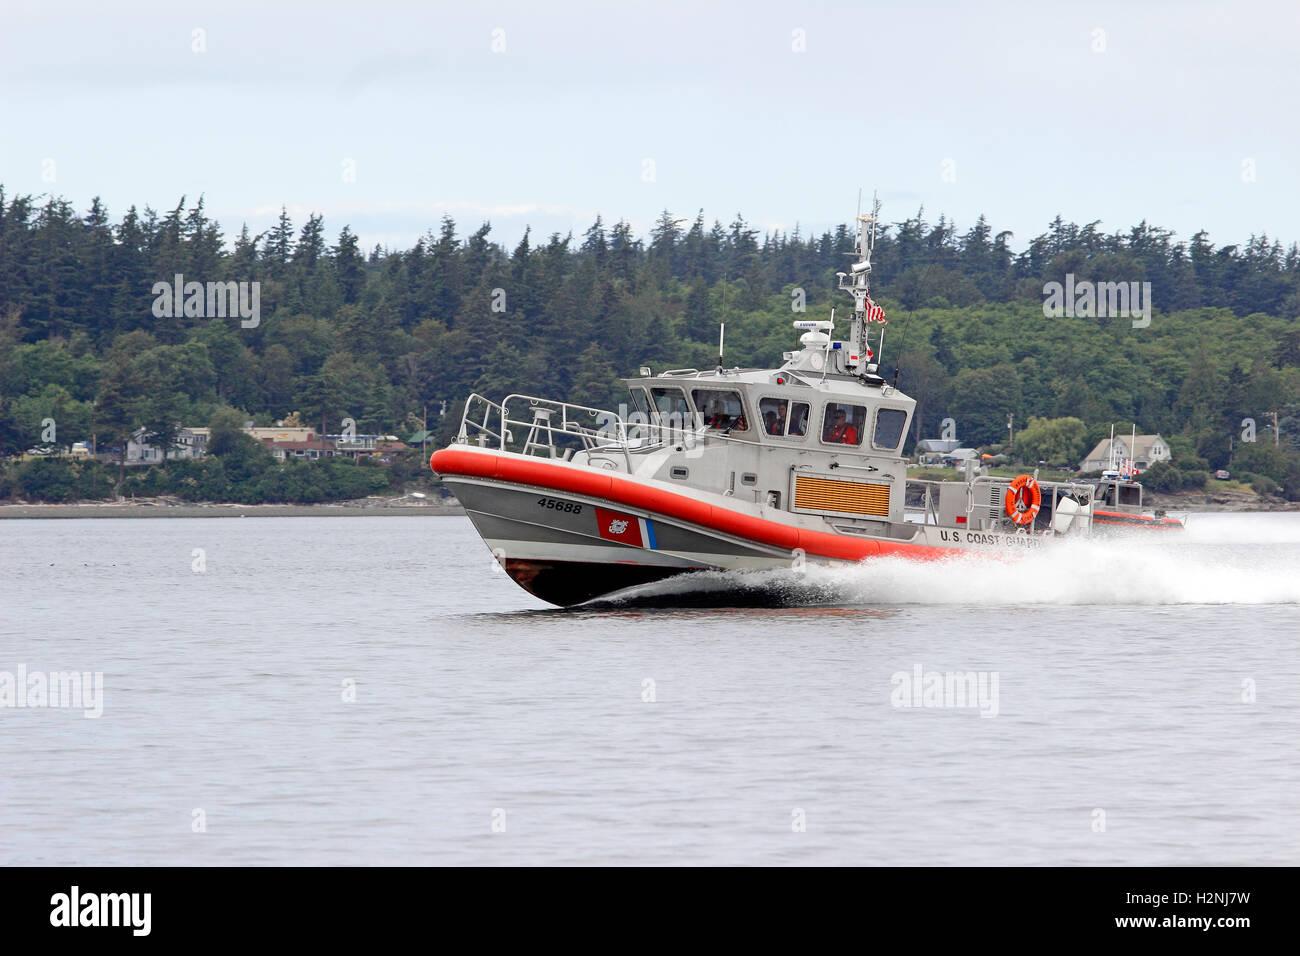 U.S. Coast Guard 45FT Response boat San Juan Islands Washington State USA - Stock Image